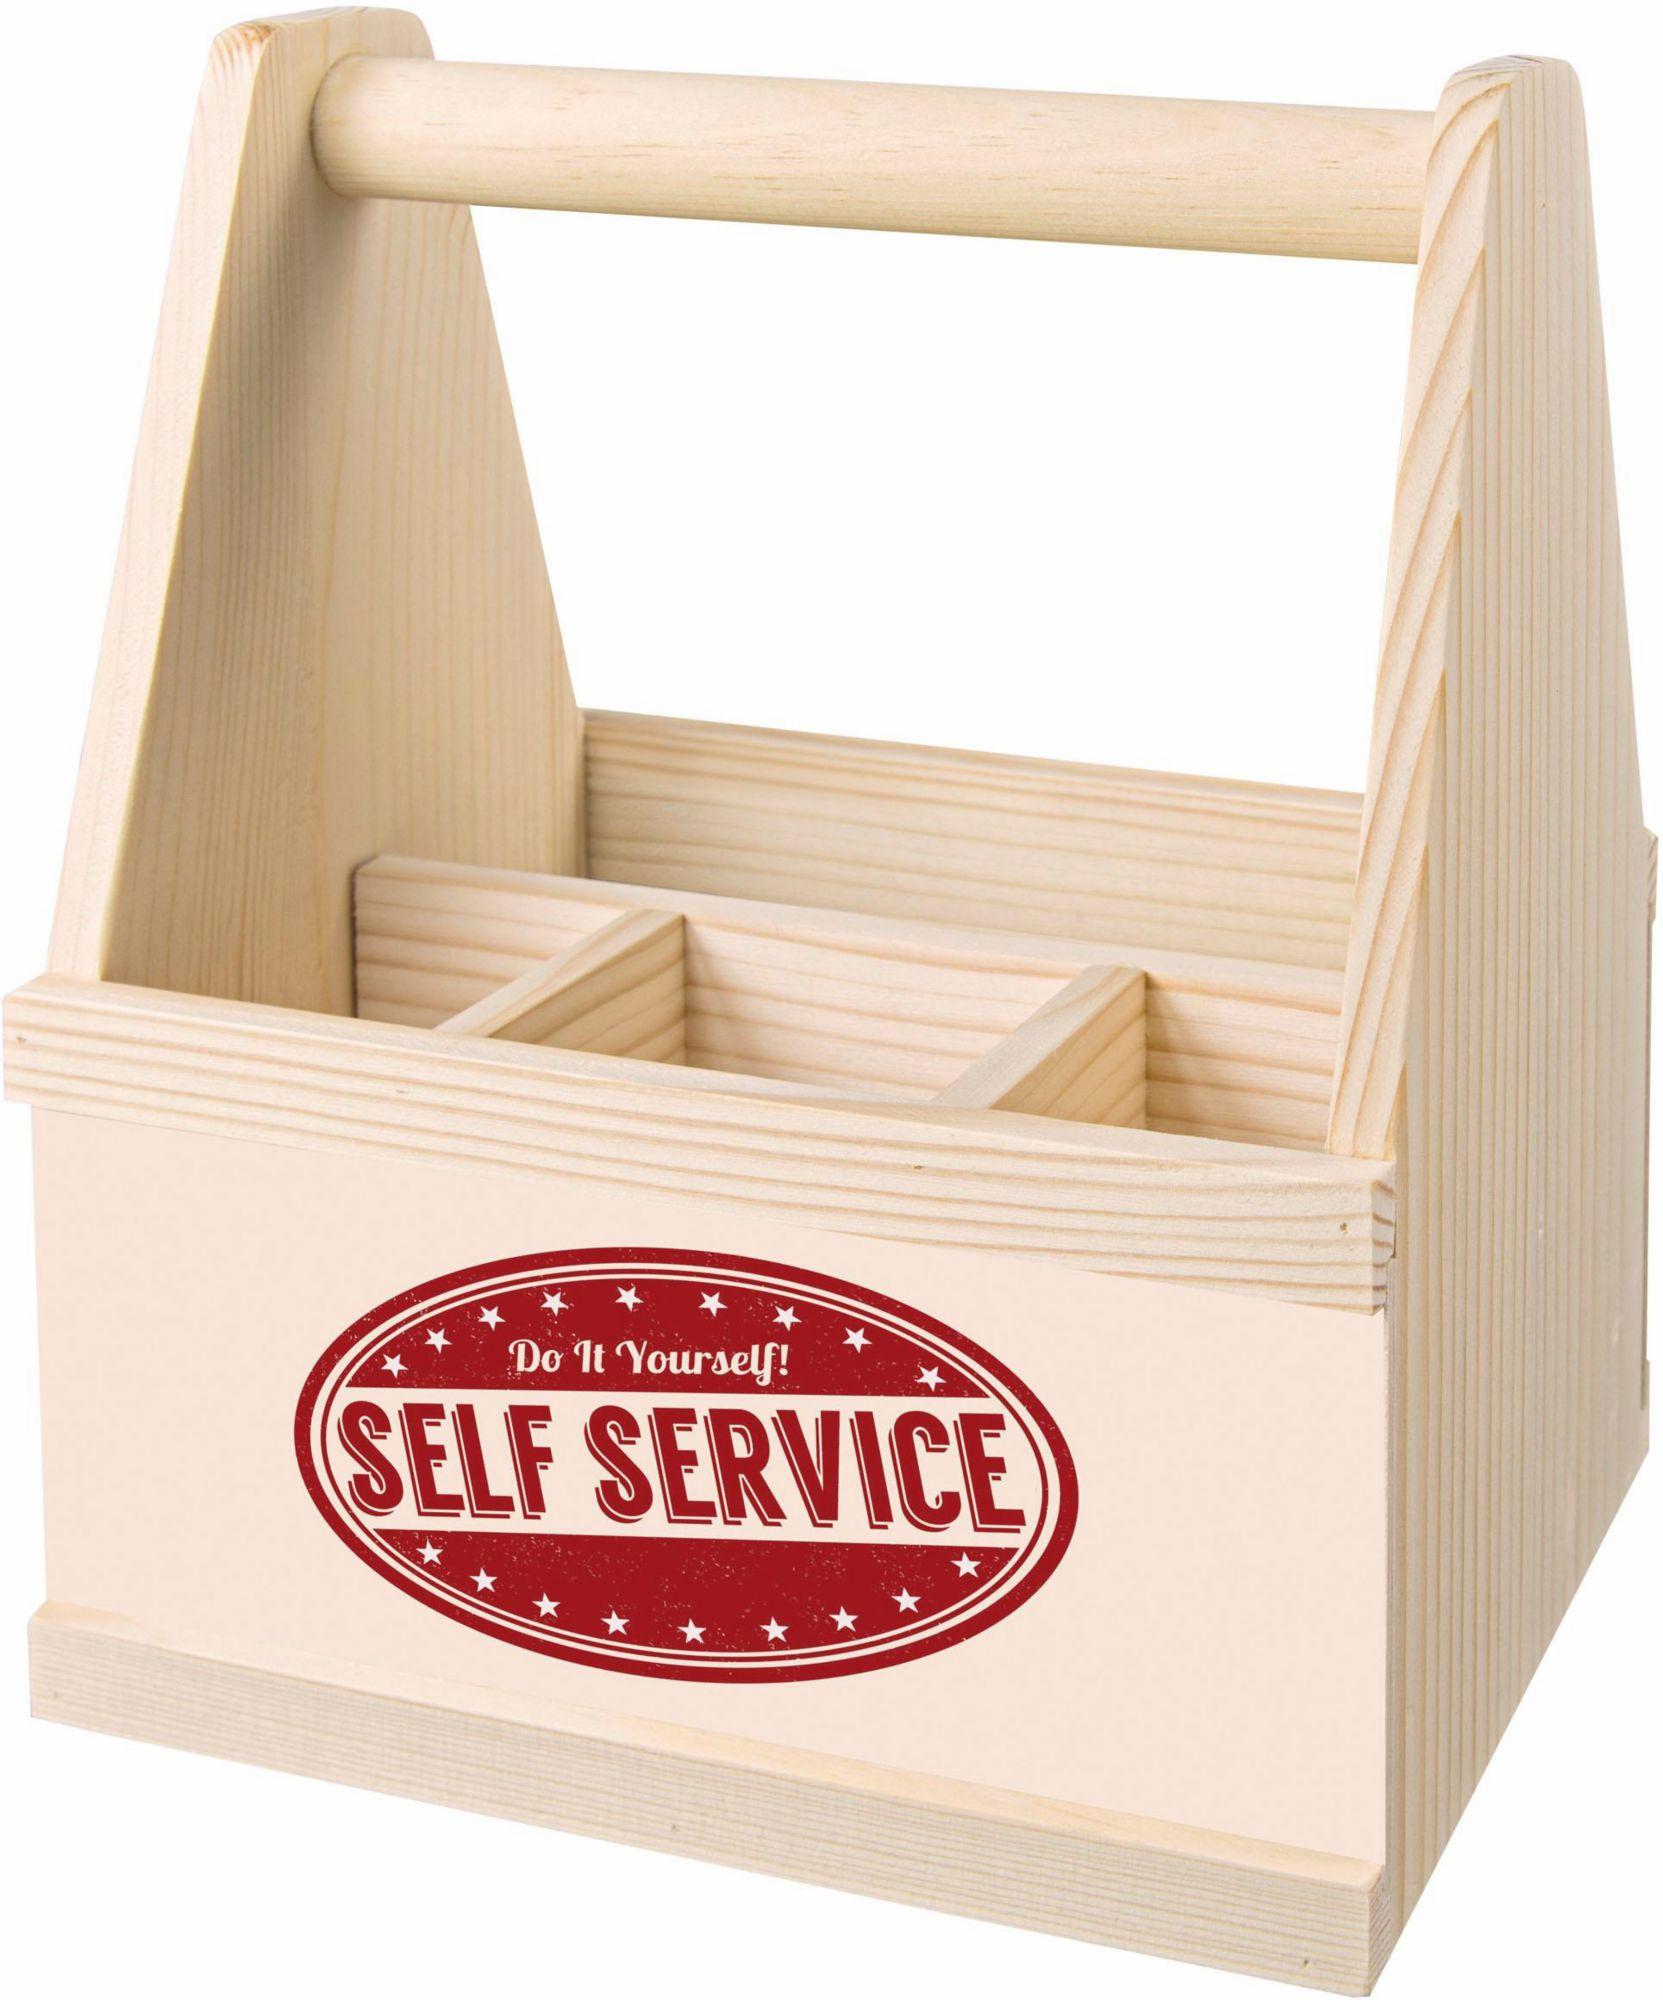 CONTENTO Contento Besteck Caddy »Self Service«